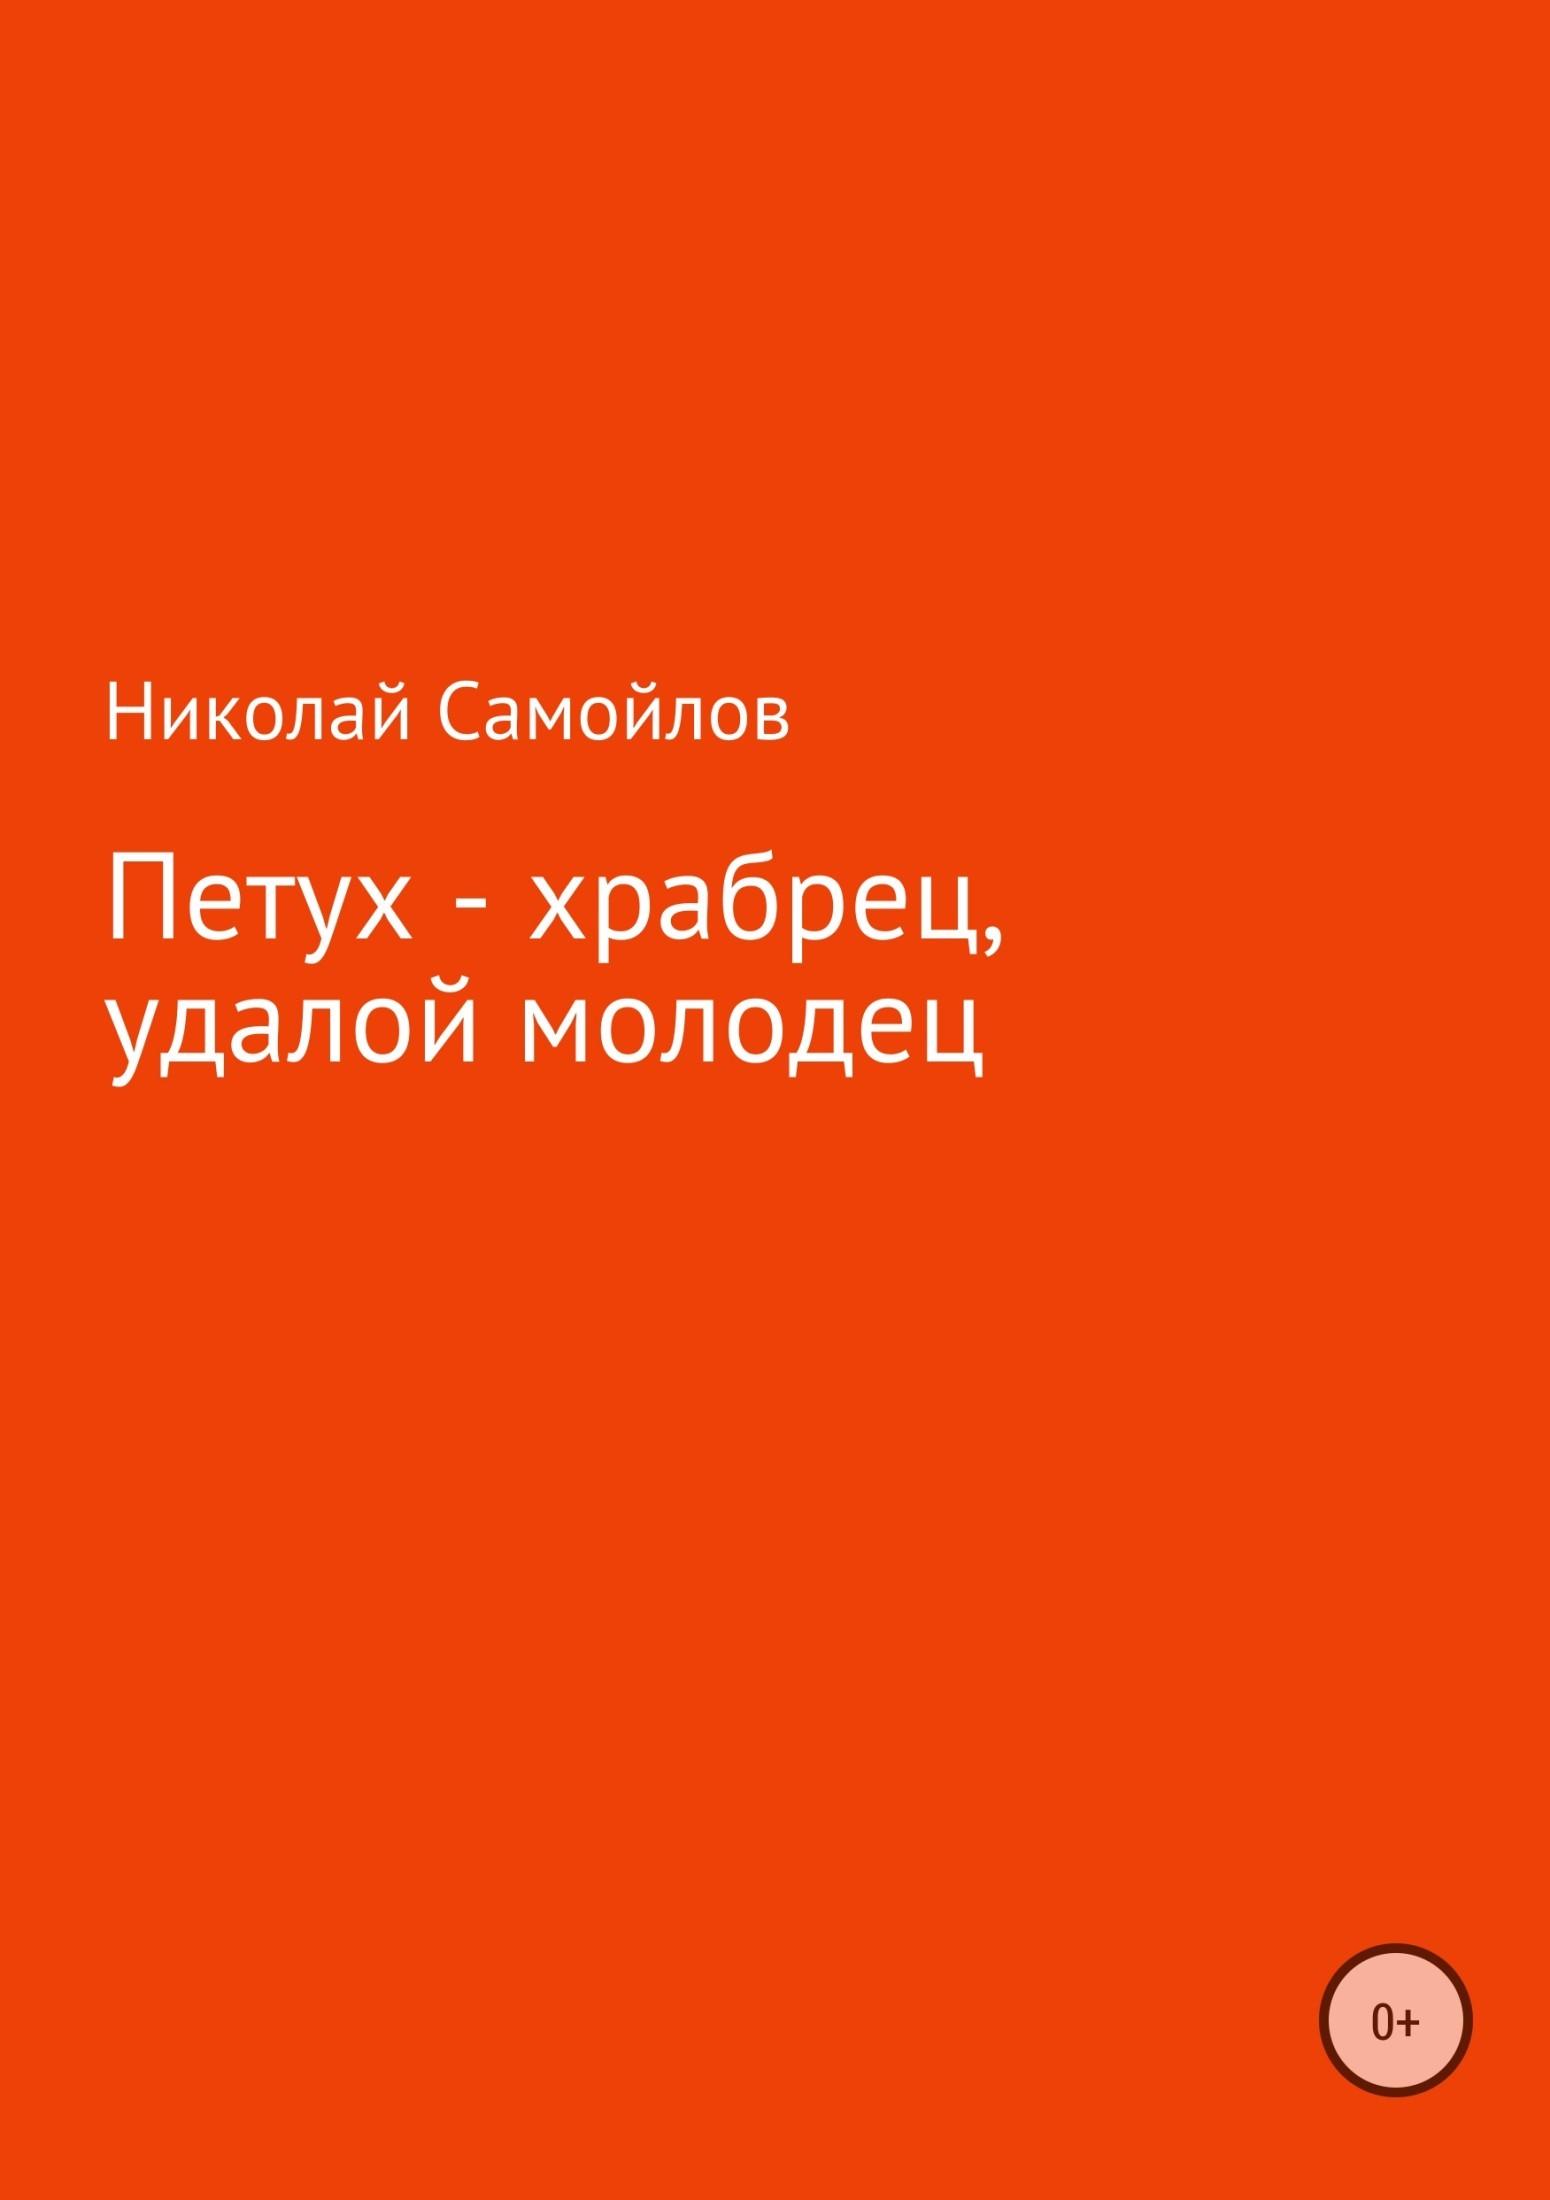 Николай Самойлов «Петух – храбрец, удалой молодец»